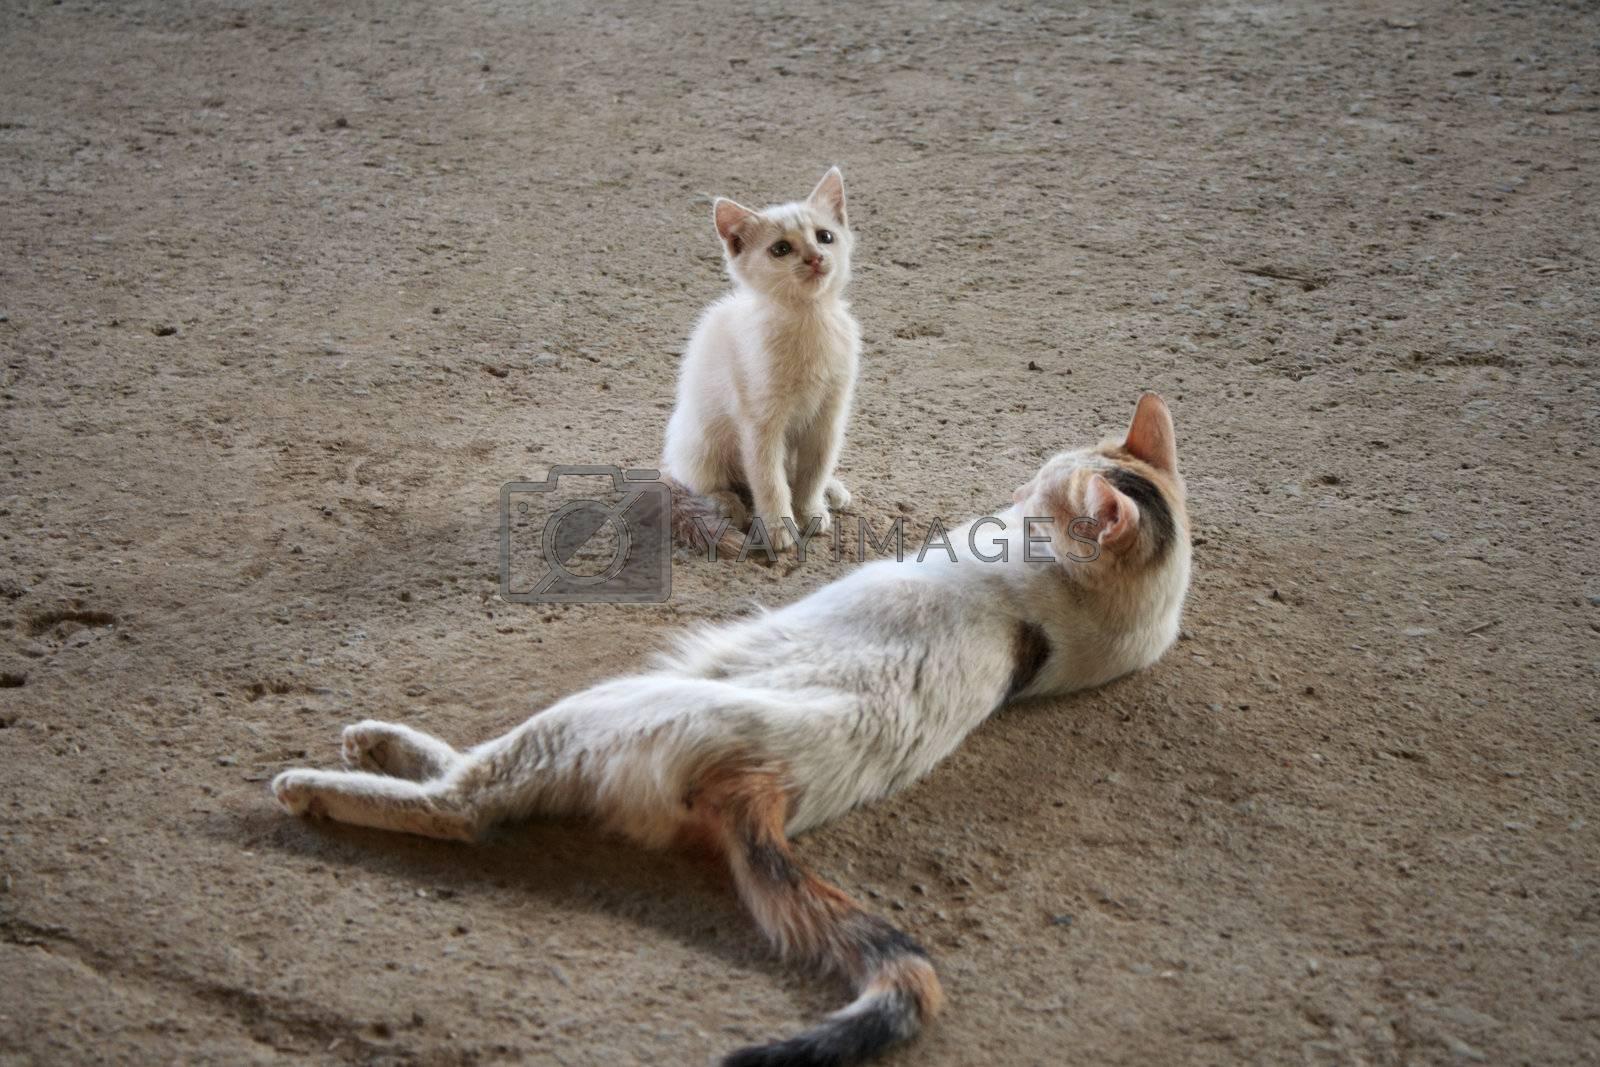 Sleeping cat and little kitten lying on the concrete floor, it's hot.